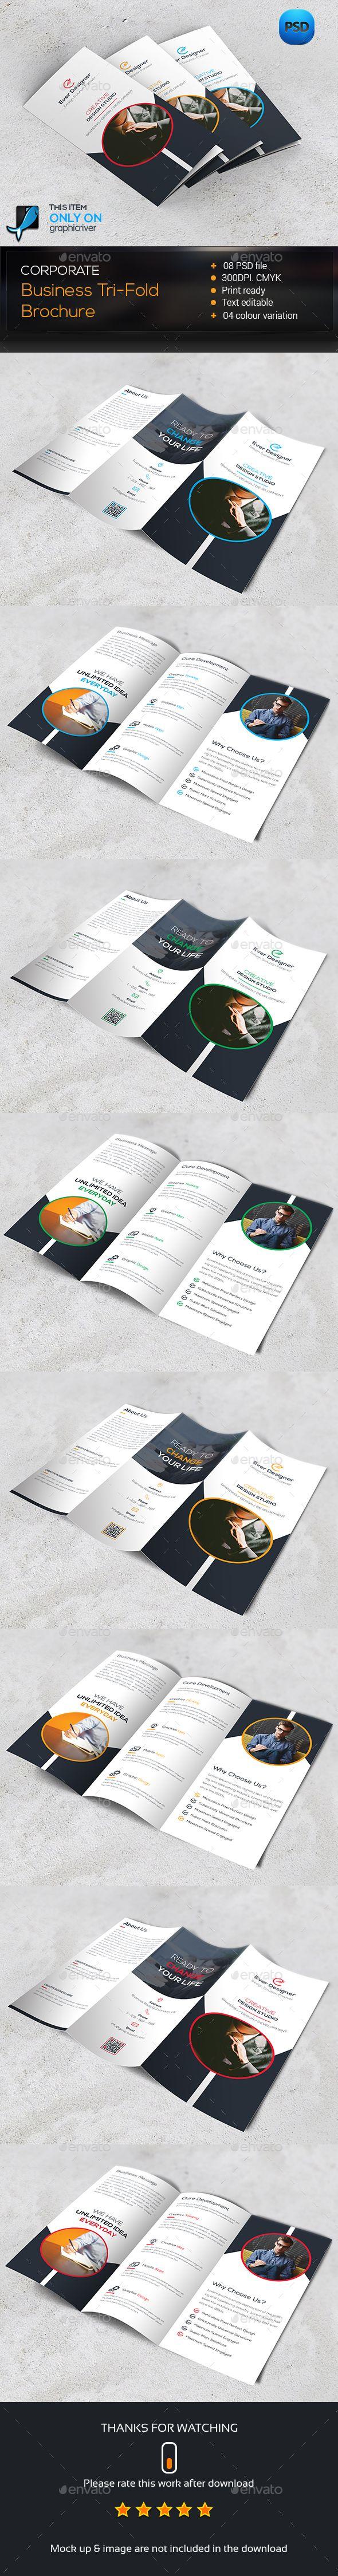 Trifold Brochure Template PSD #design Download: http://graphicriver.net/item/trifold-brochure/14350209?ref=ksioks